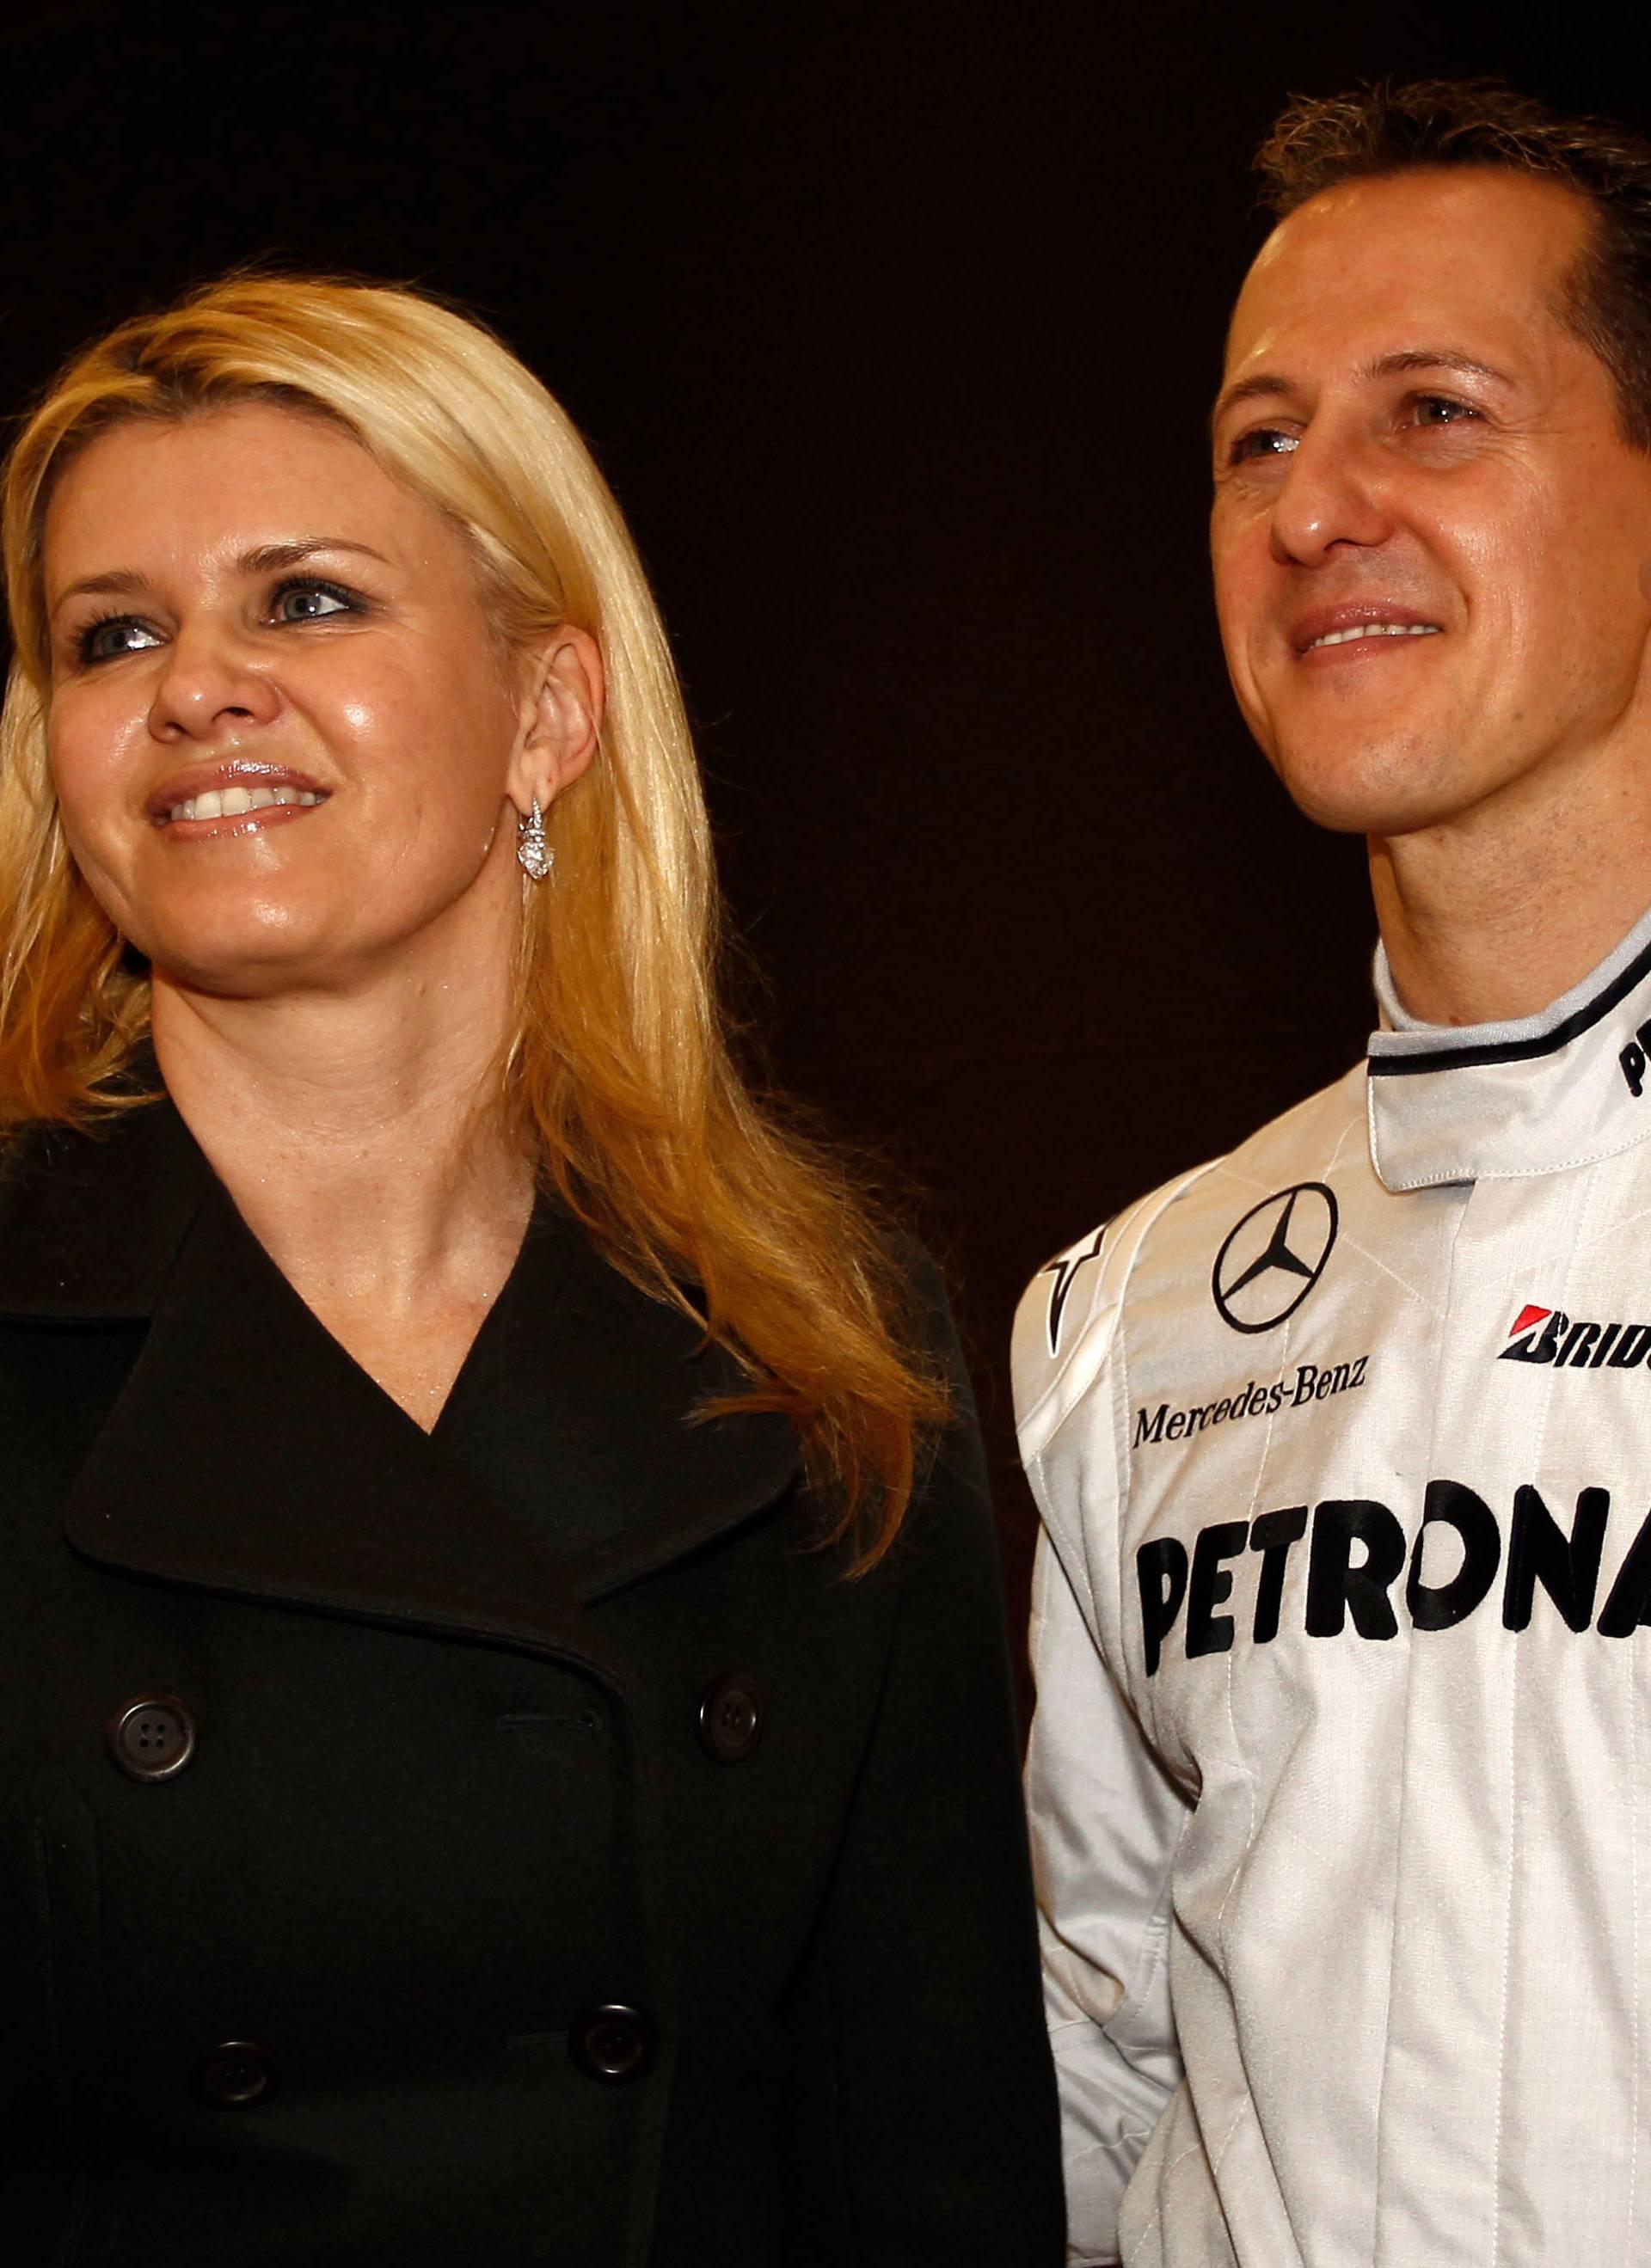 Formula One - Mercedes GP